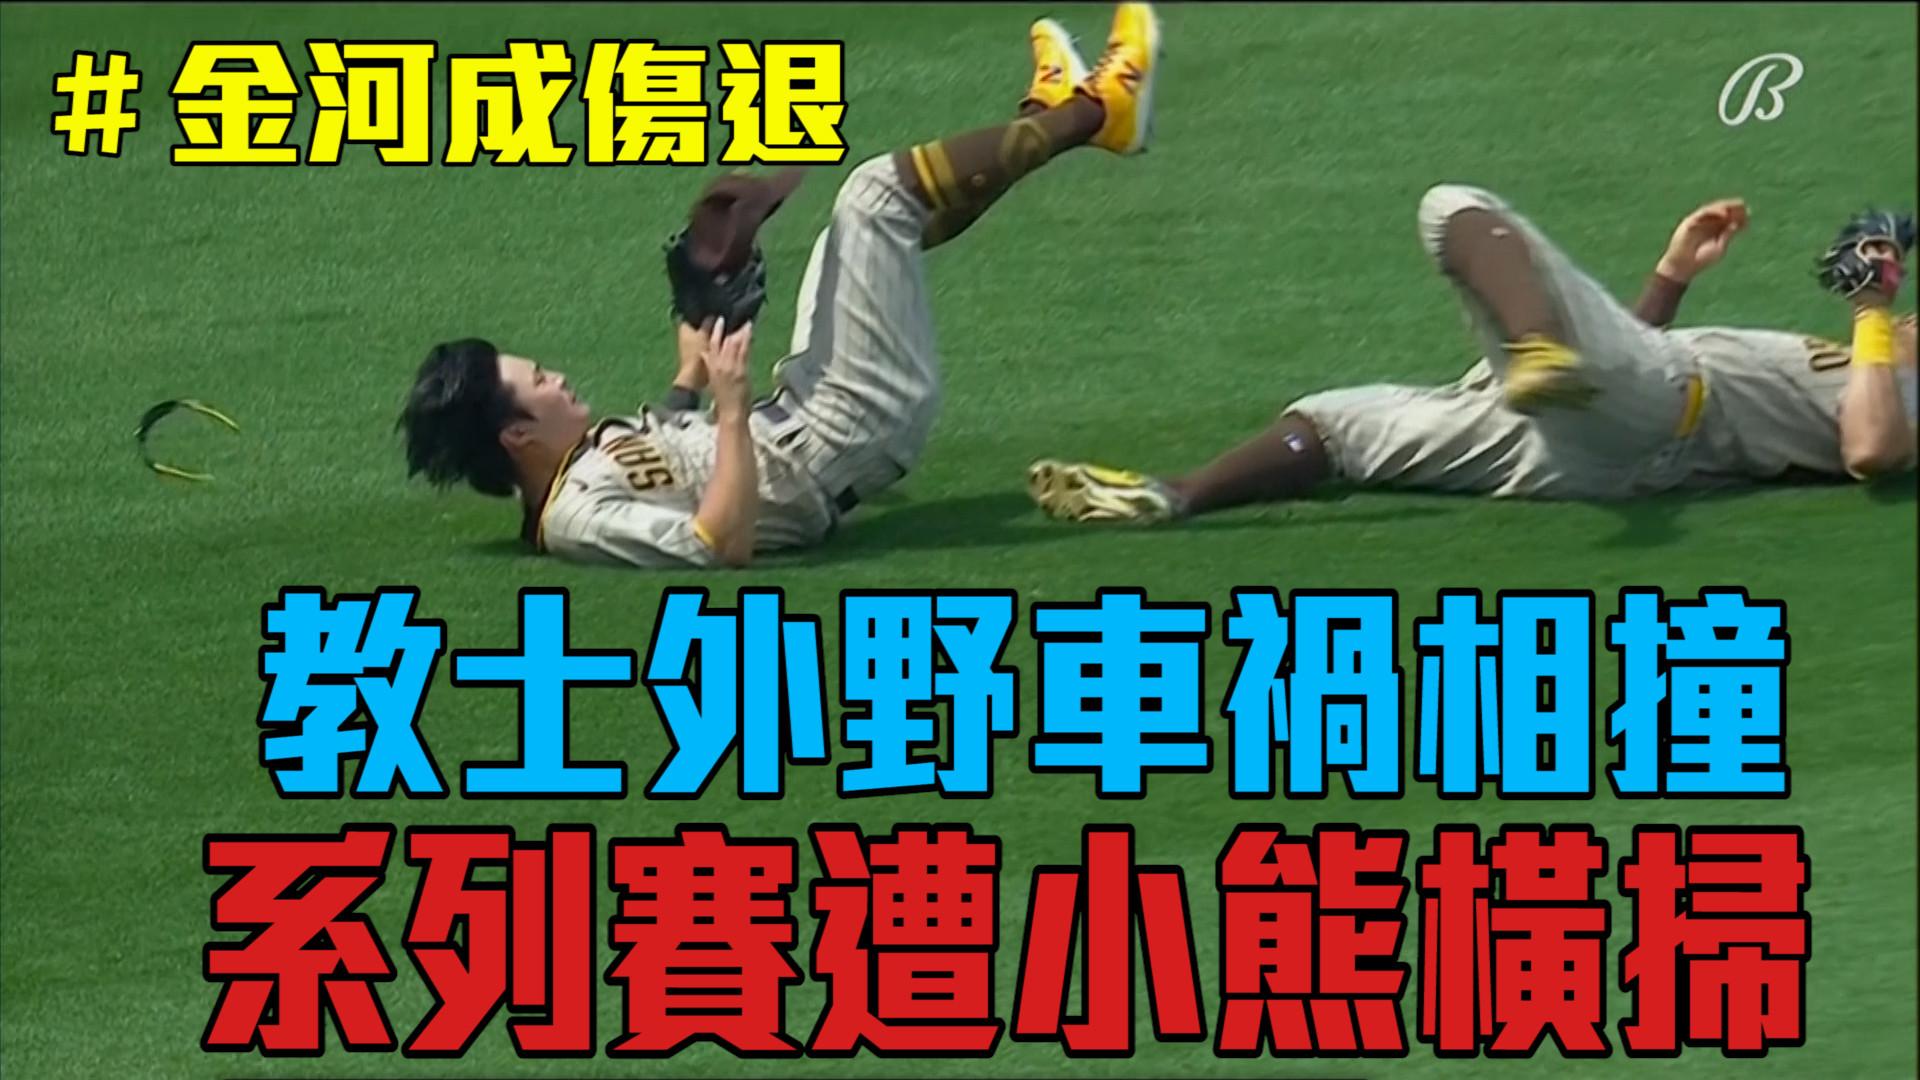 【MLB看愛爾達】金河成與隊友相撞 小熊系列賽橫掃教士 06/03